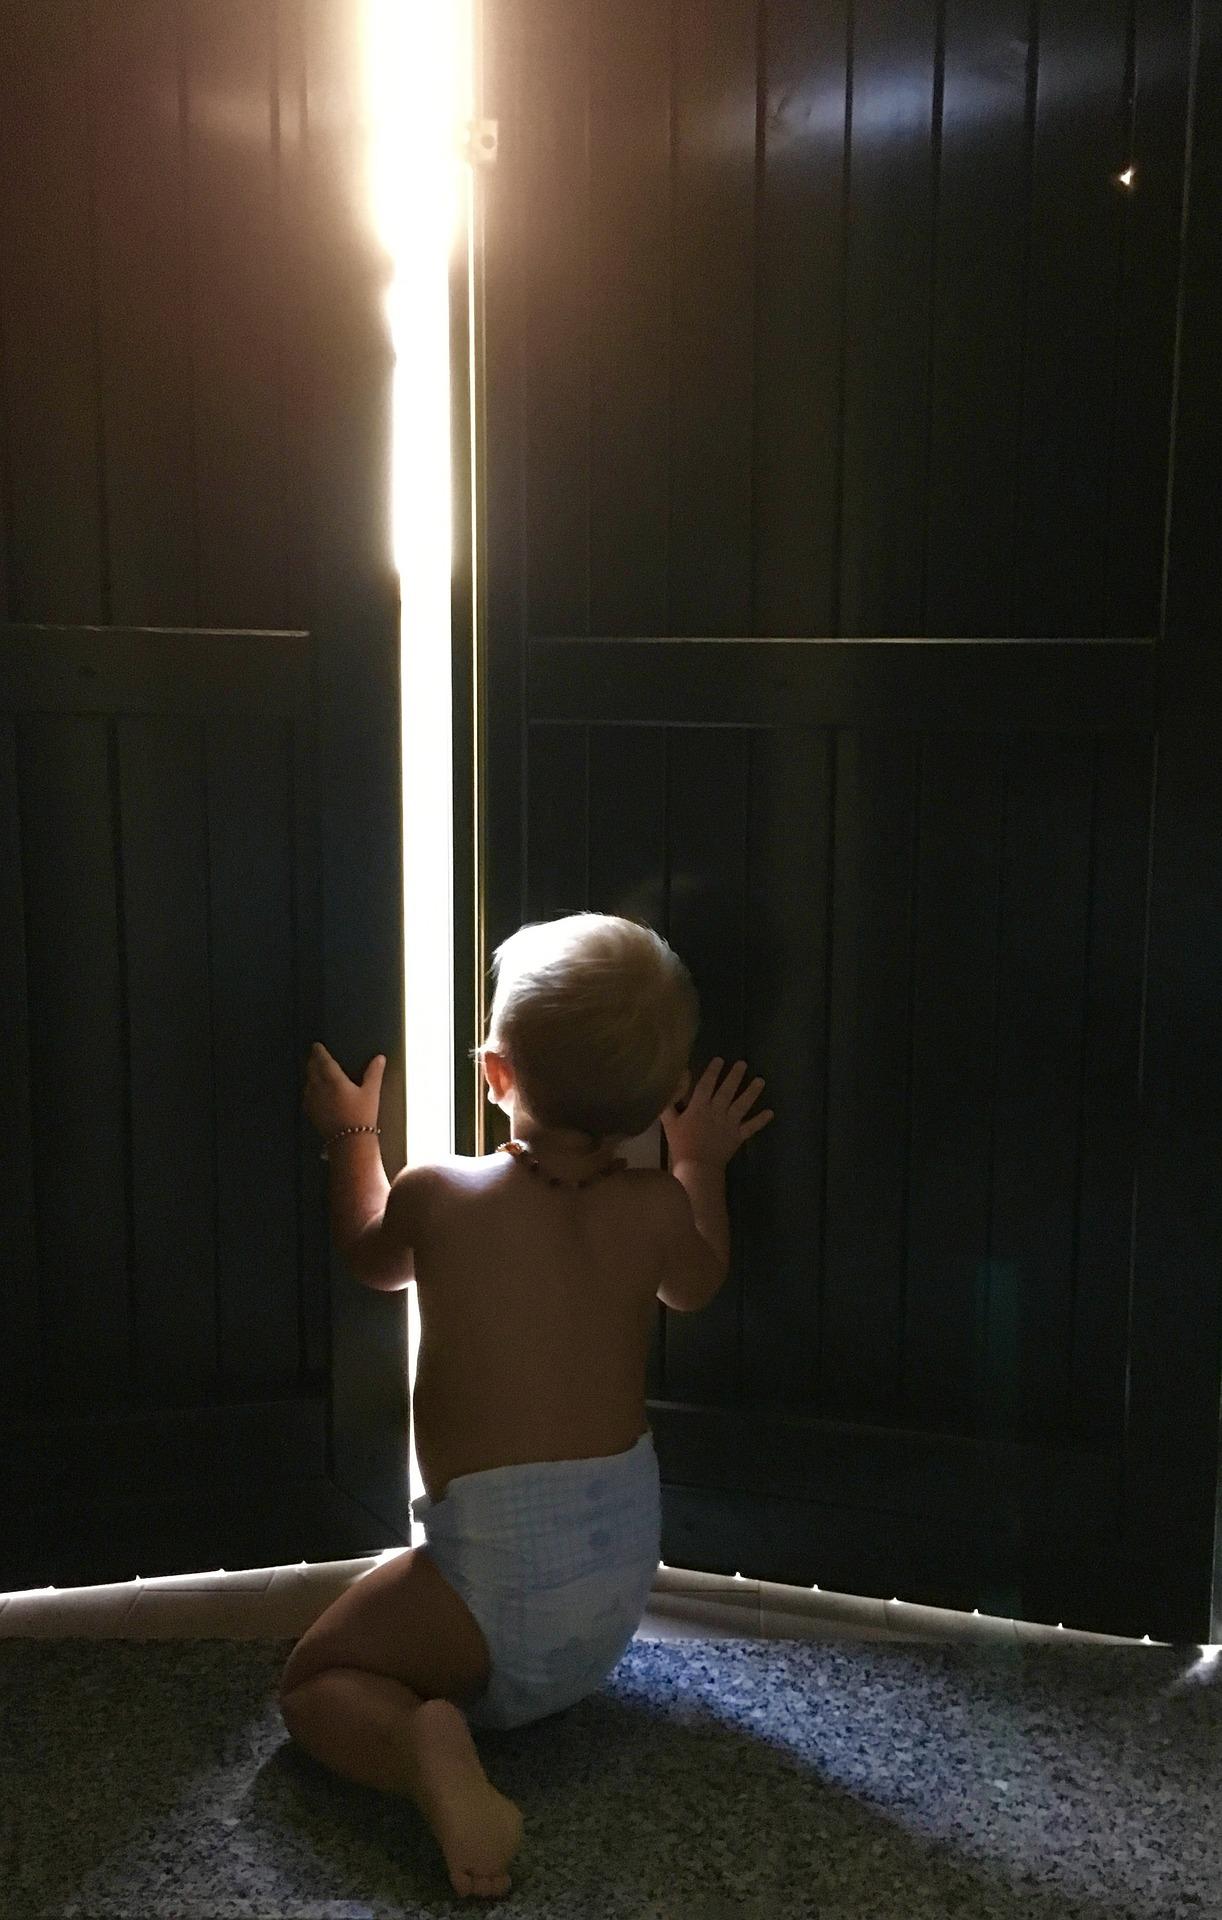 bébé lumière.jpg